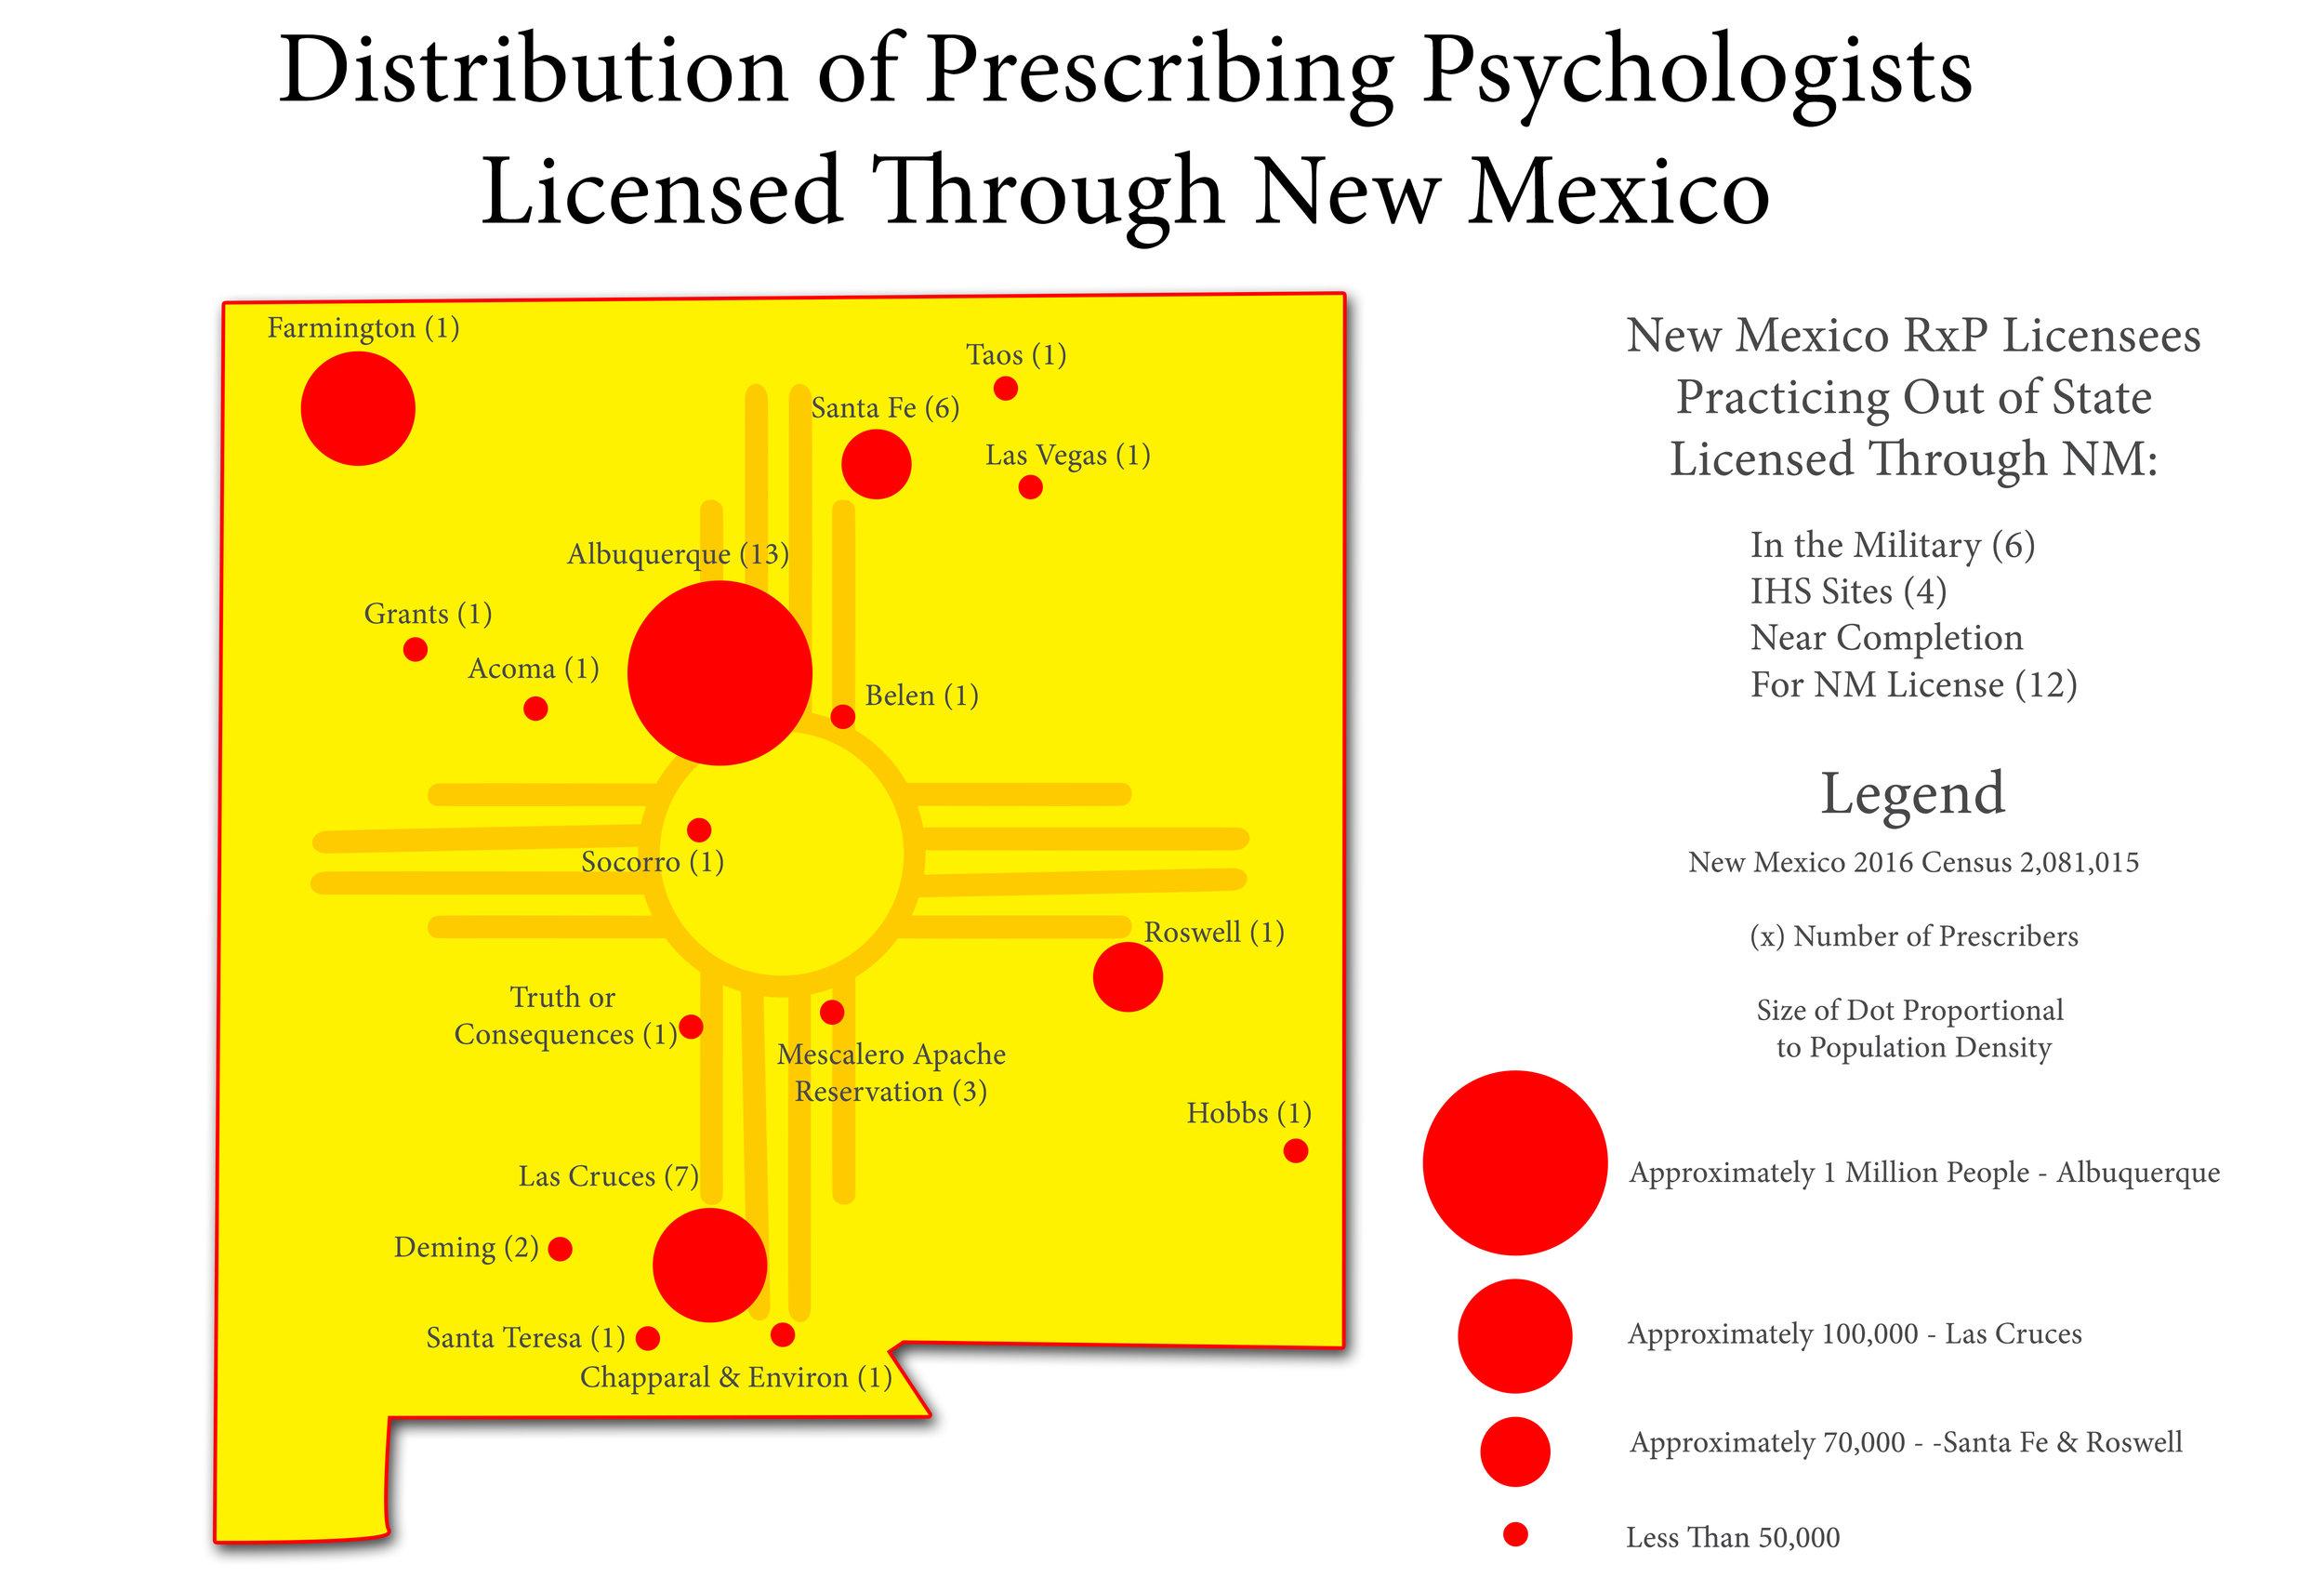 Distribution of Prescribing Psychologists.jpg